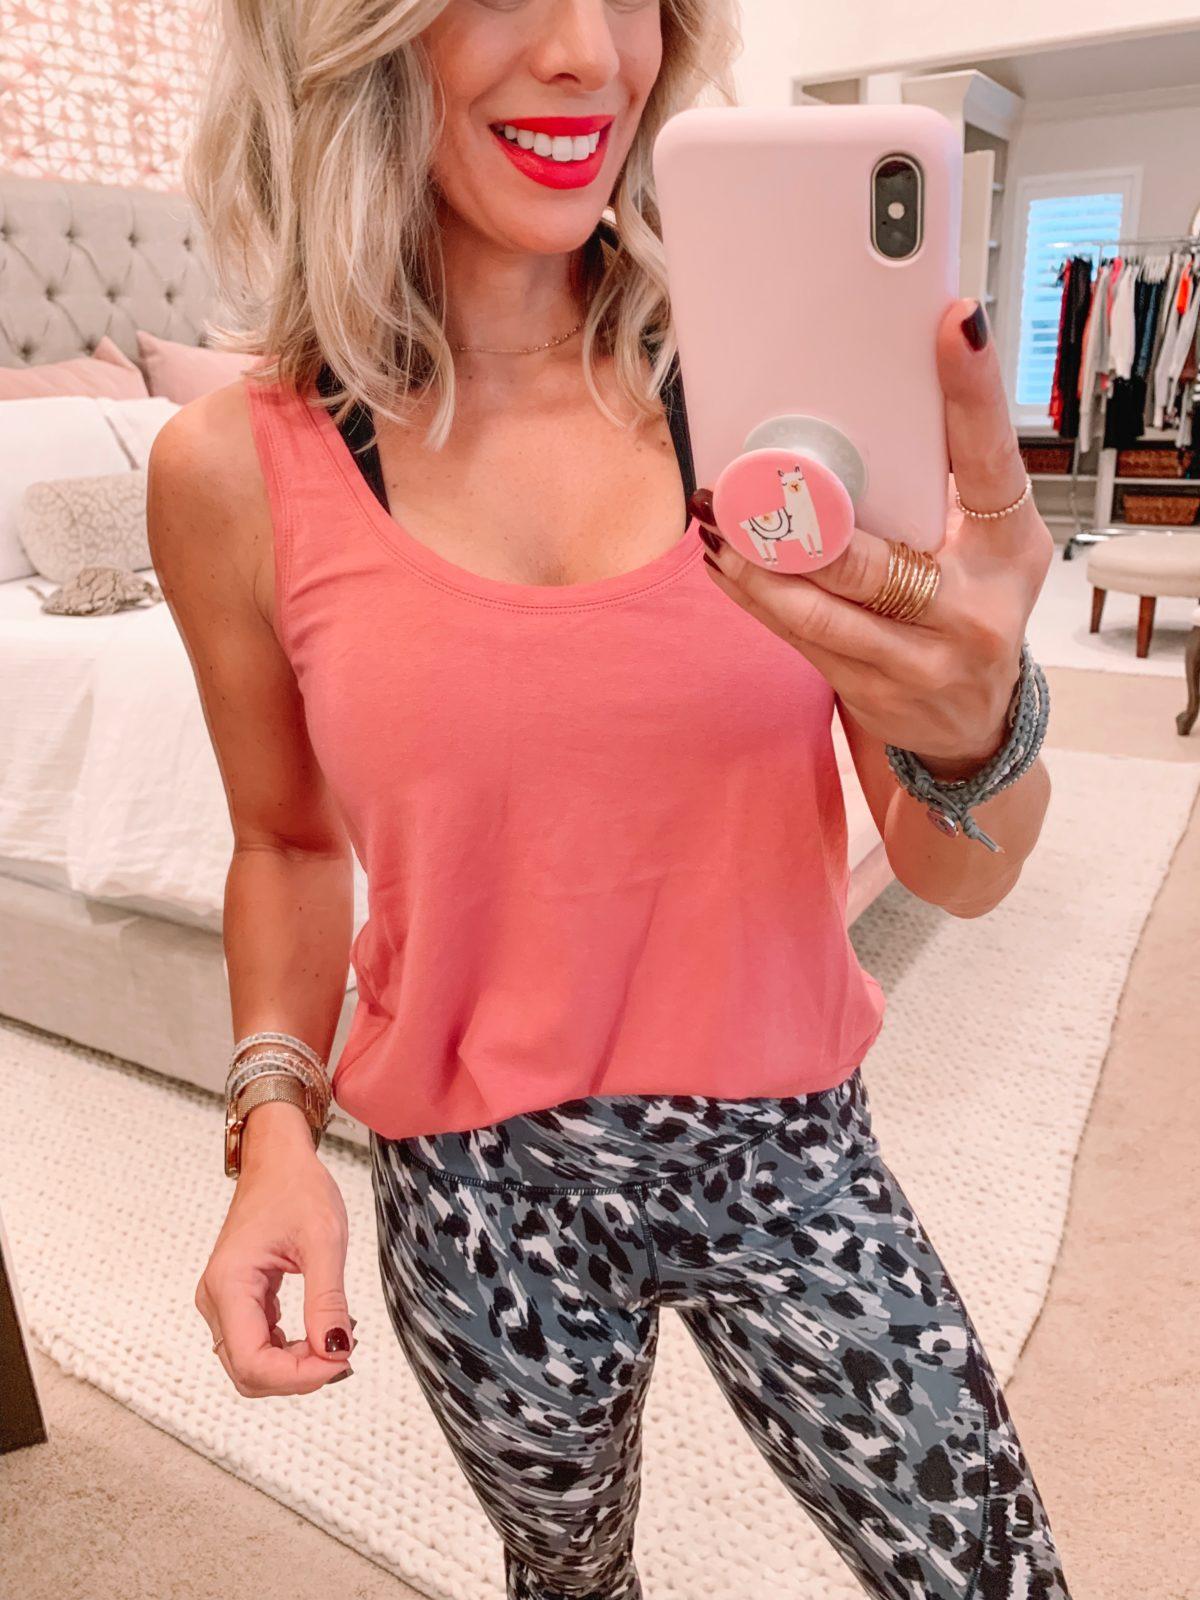 Amazon fashion haul, animal print leggings and tank